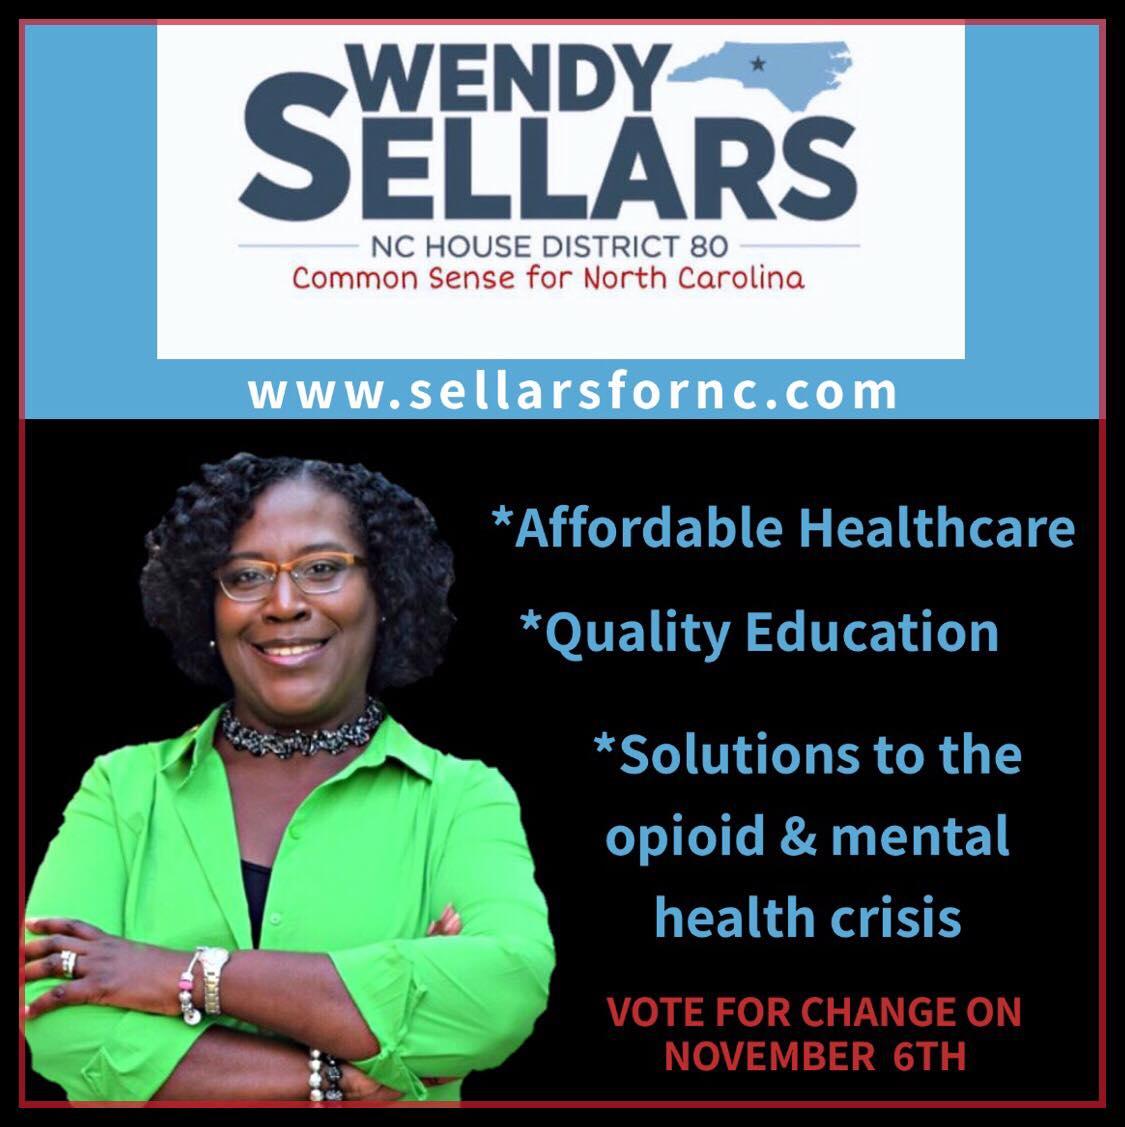 Wendy Sellars for NC